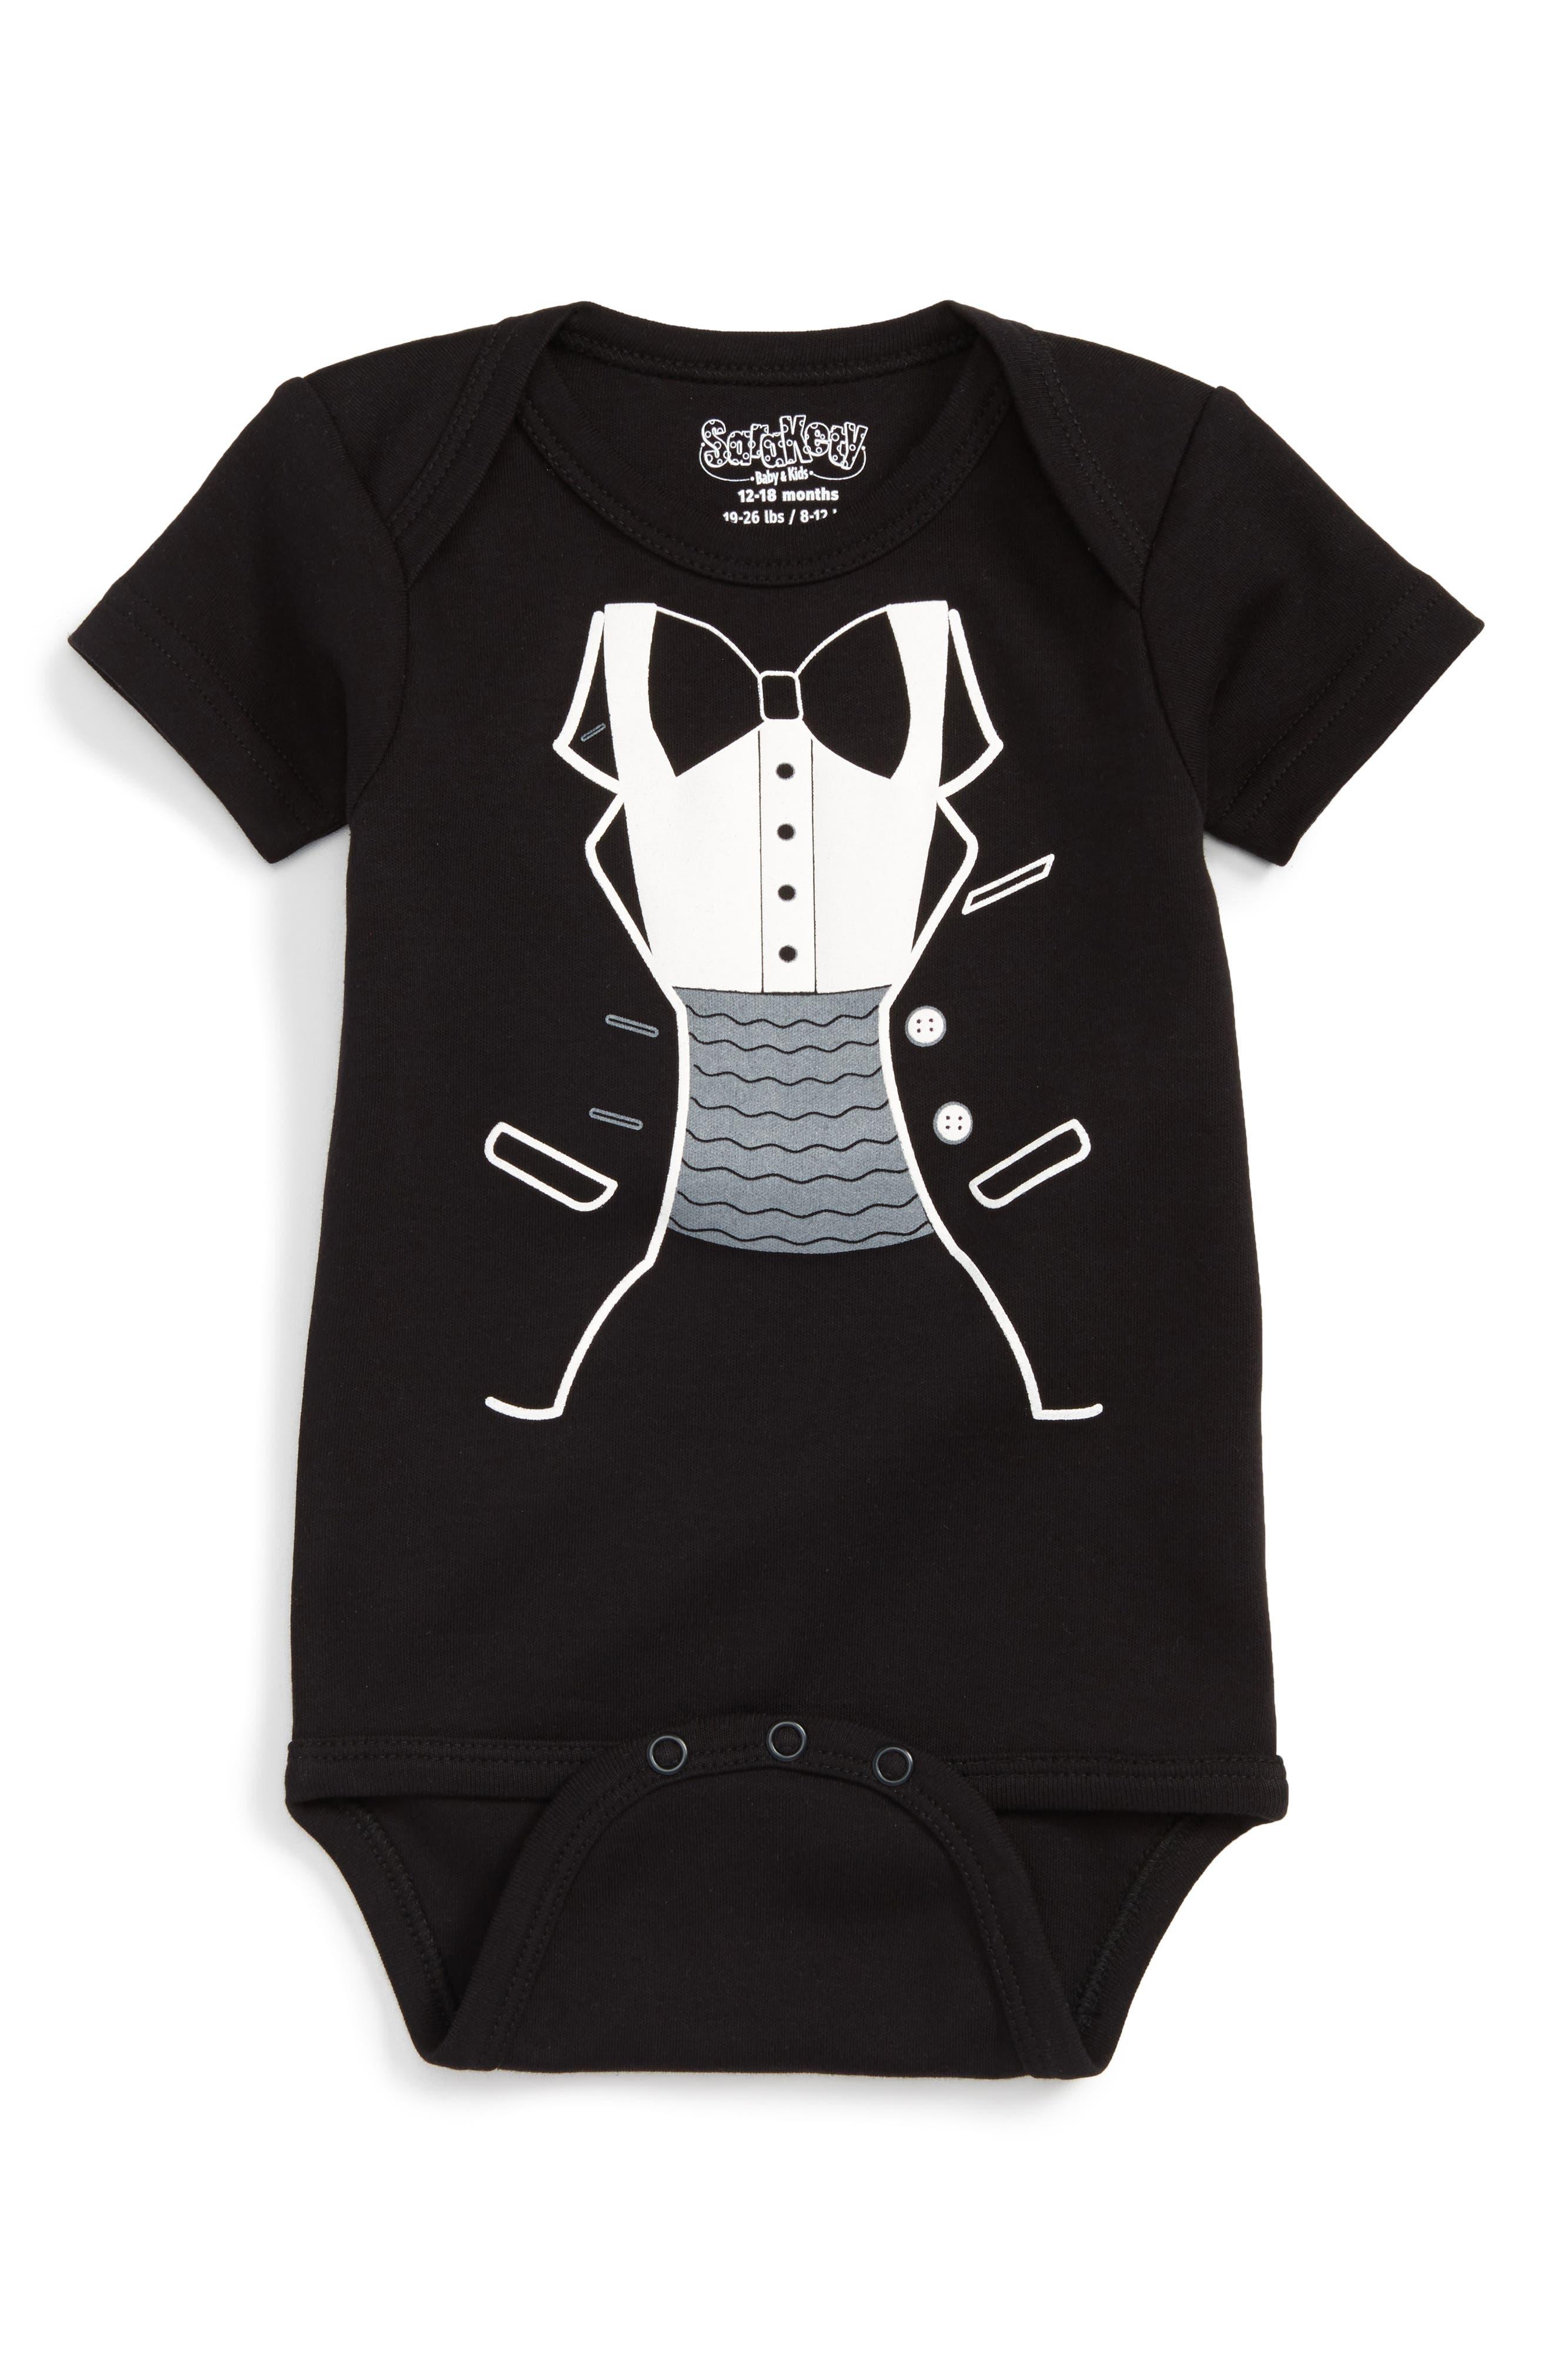 Main Image - Sara Kety Baby & Kids Tuxedo Print Bodysuit (Baby Boys)